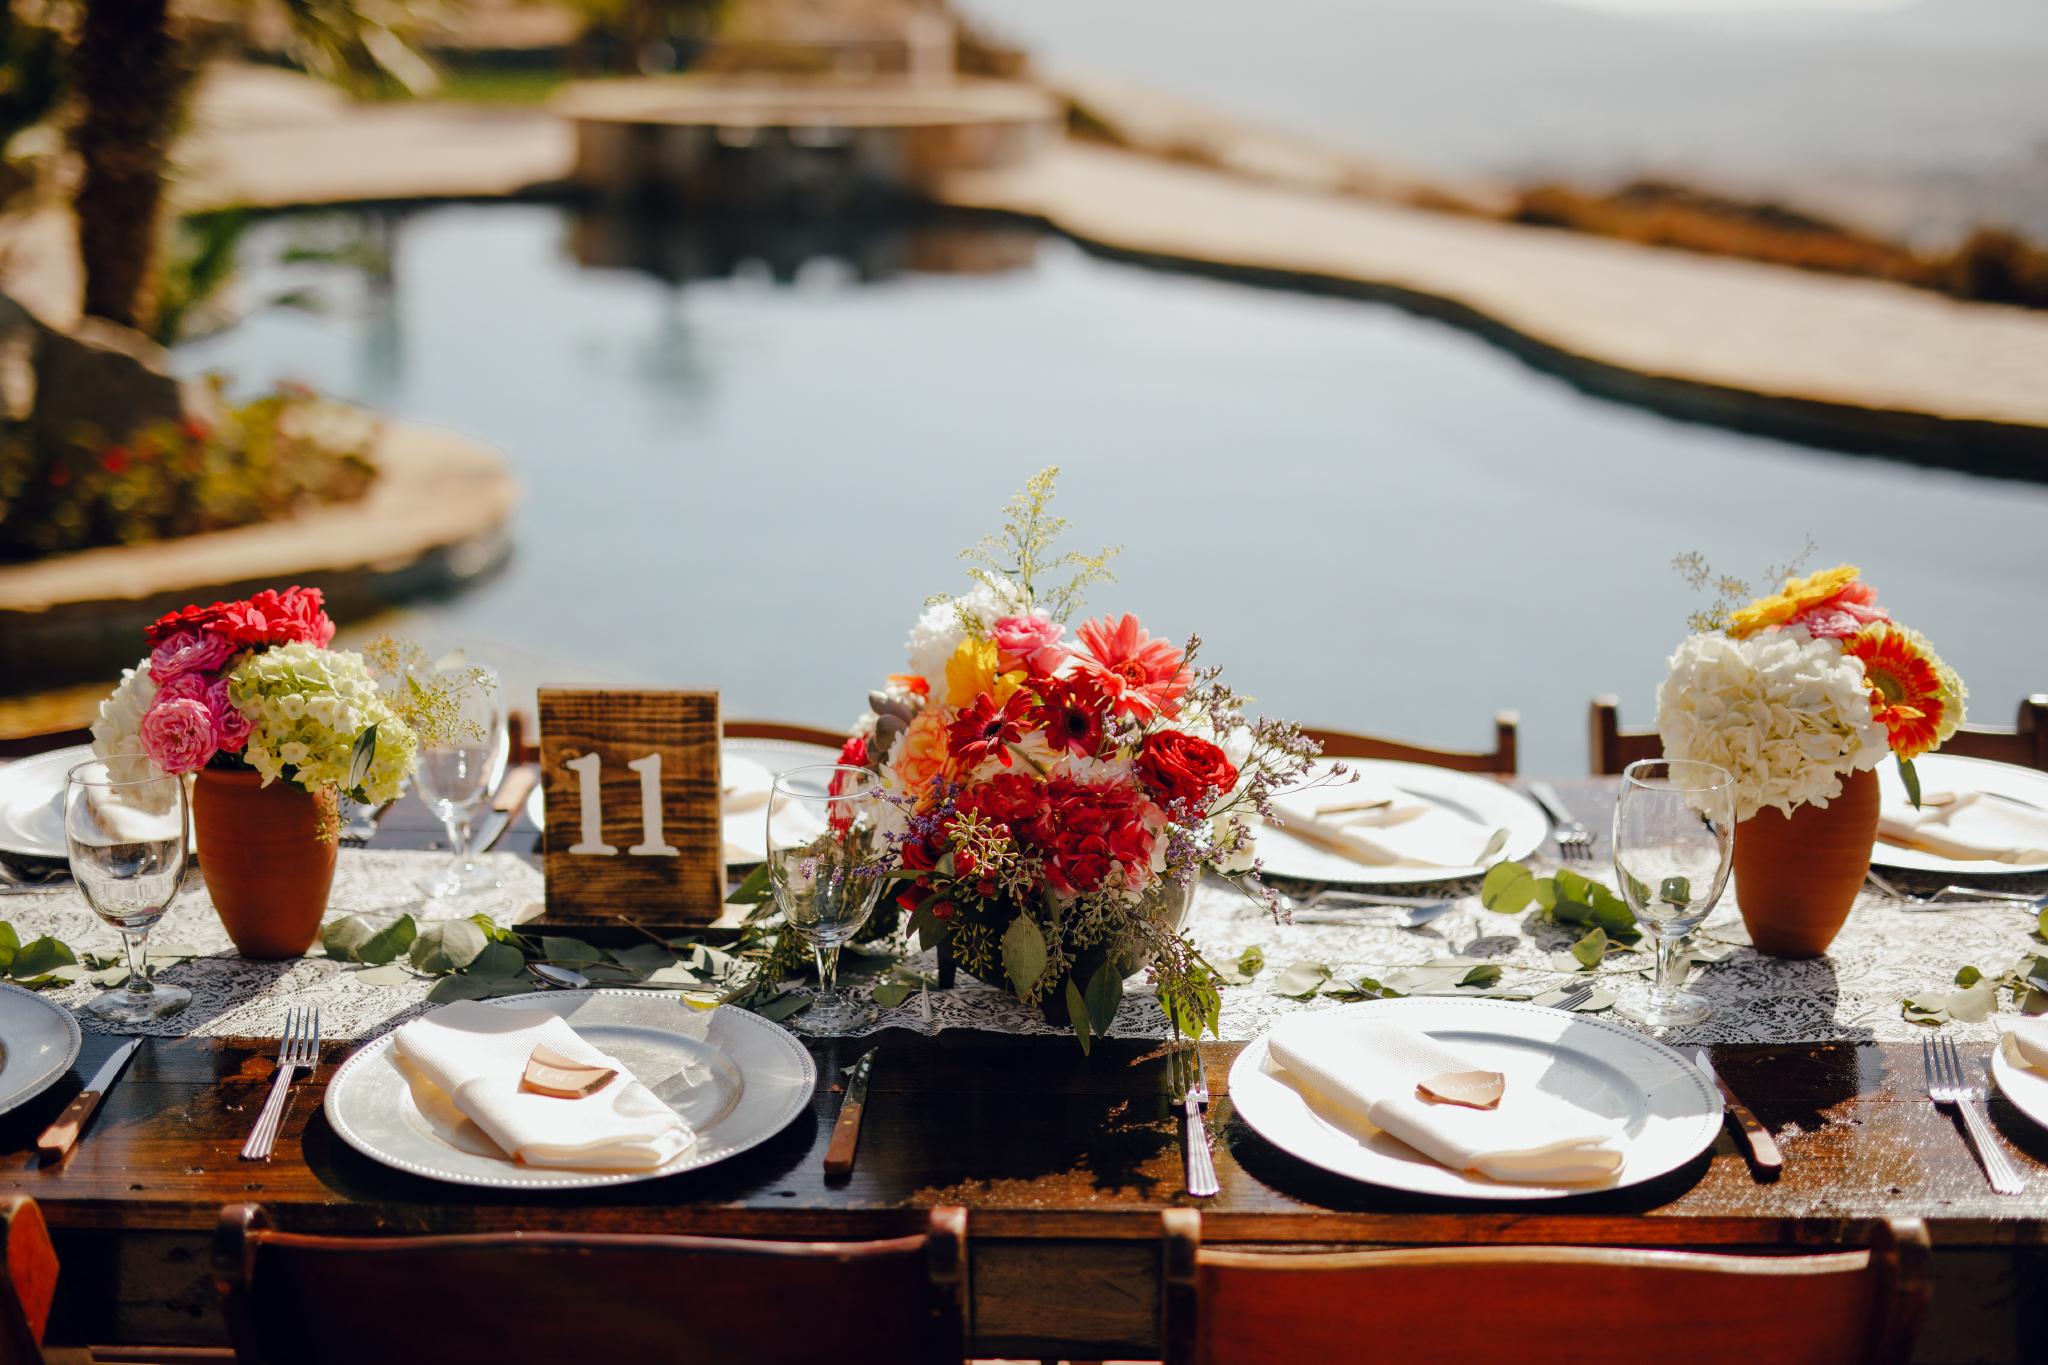 San Diego Wedding Photographer | table setting at a Montana Cielo wedding